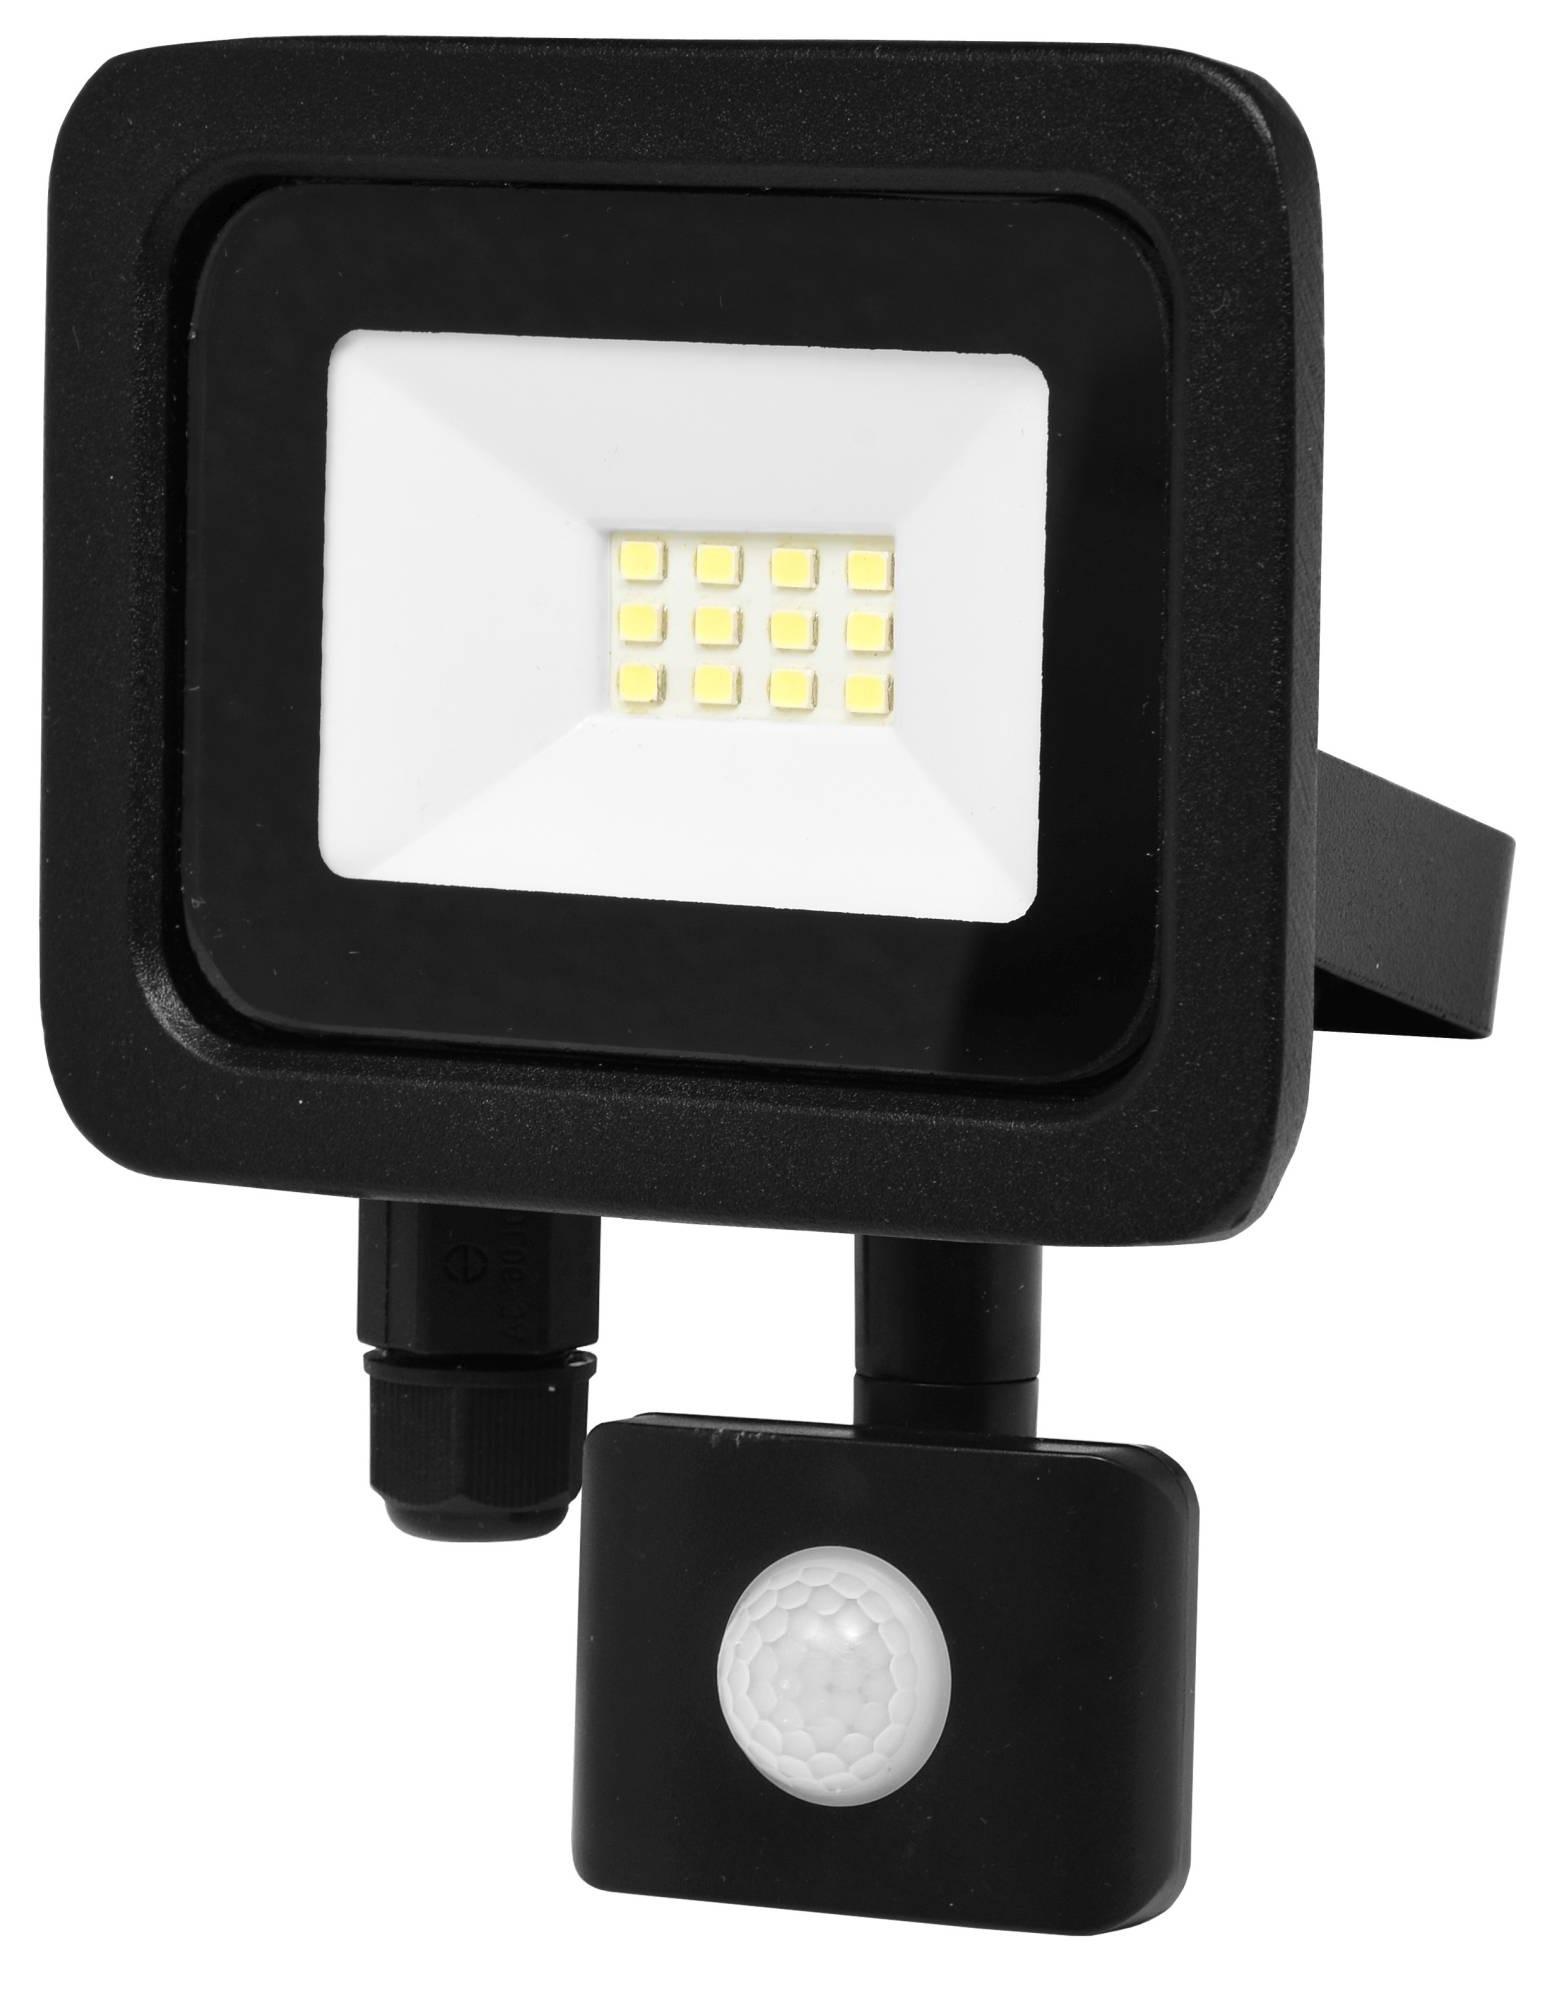 Ecolite Čierný LED reflektor 10W s pohybovym čidlom RLEDF48WL-10W/PIR